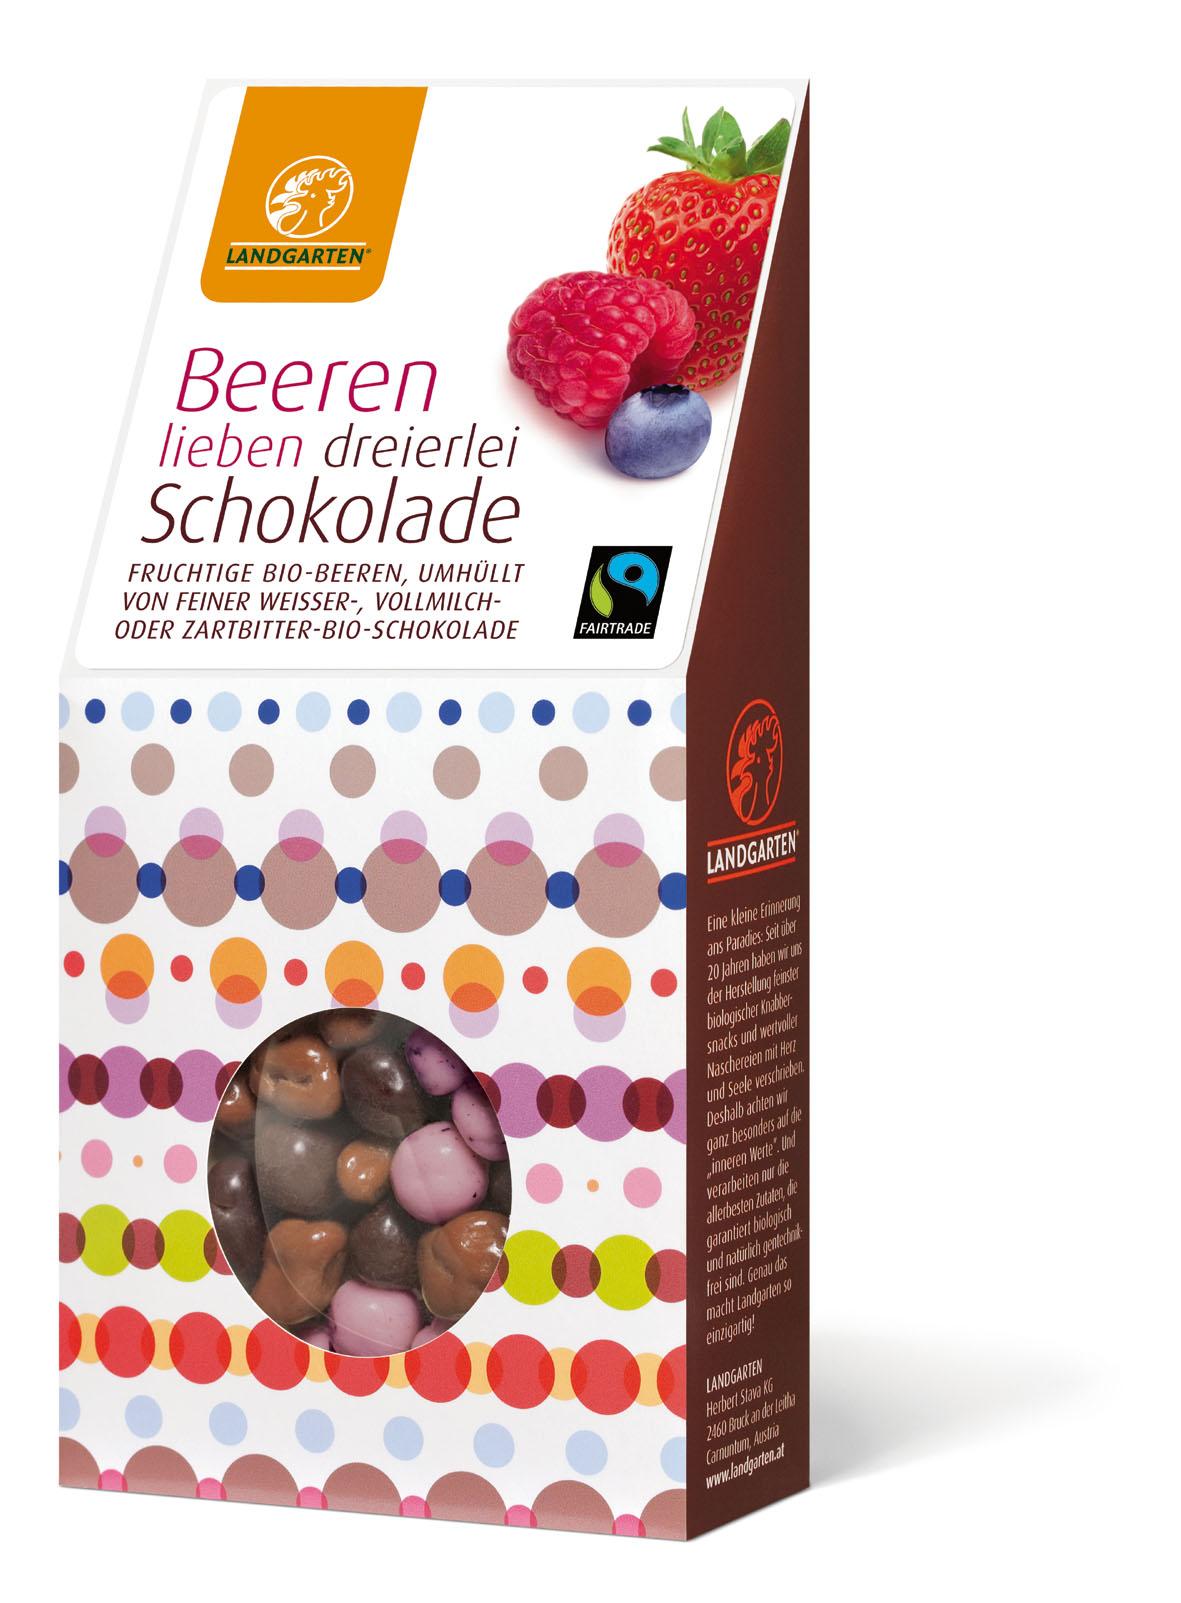 Bio FT Beeren in dreierlei Schokolade 50g